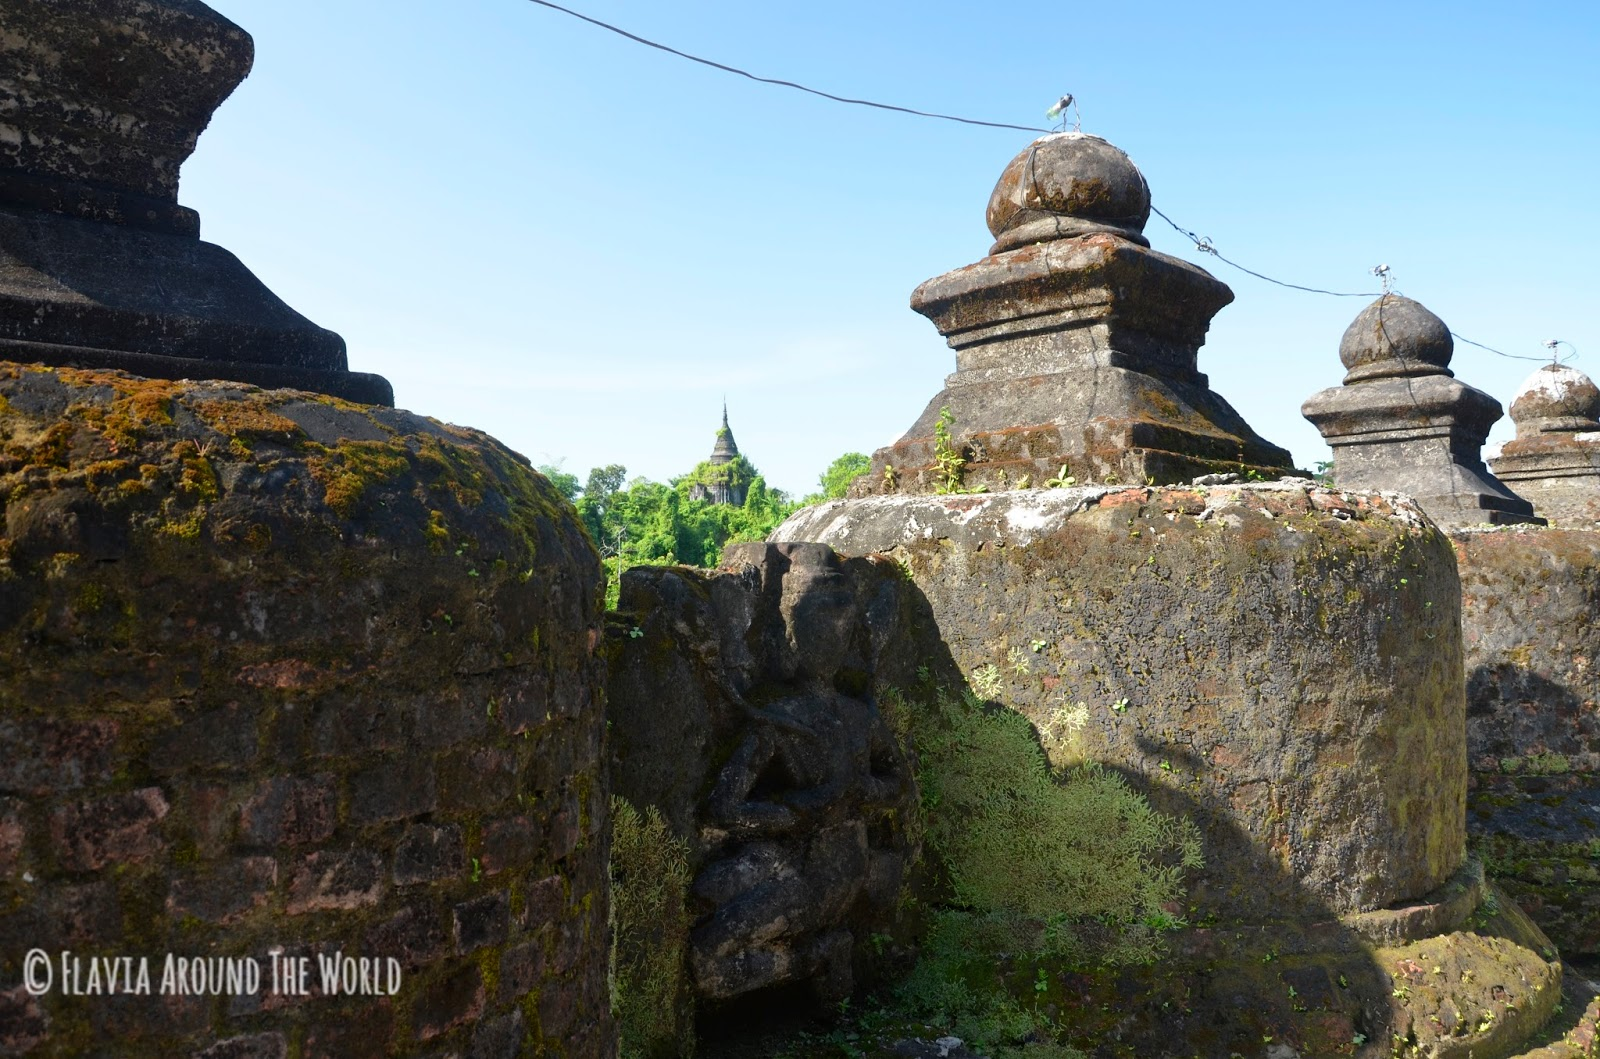 Detalle del templo Shitthaung, Mrauk U, Myanmar